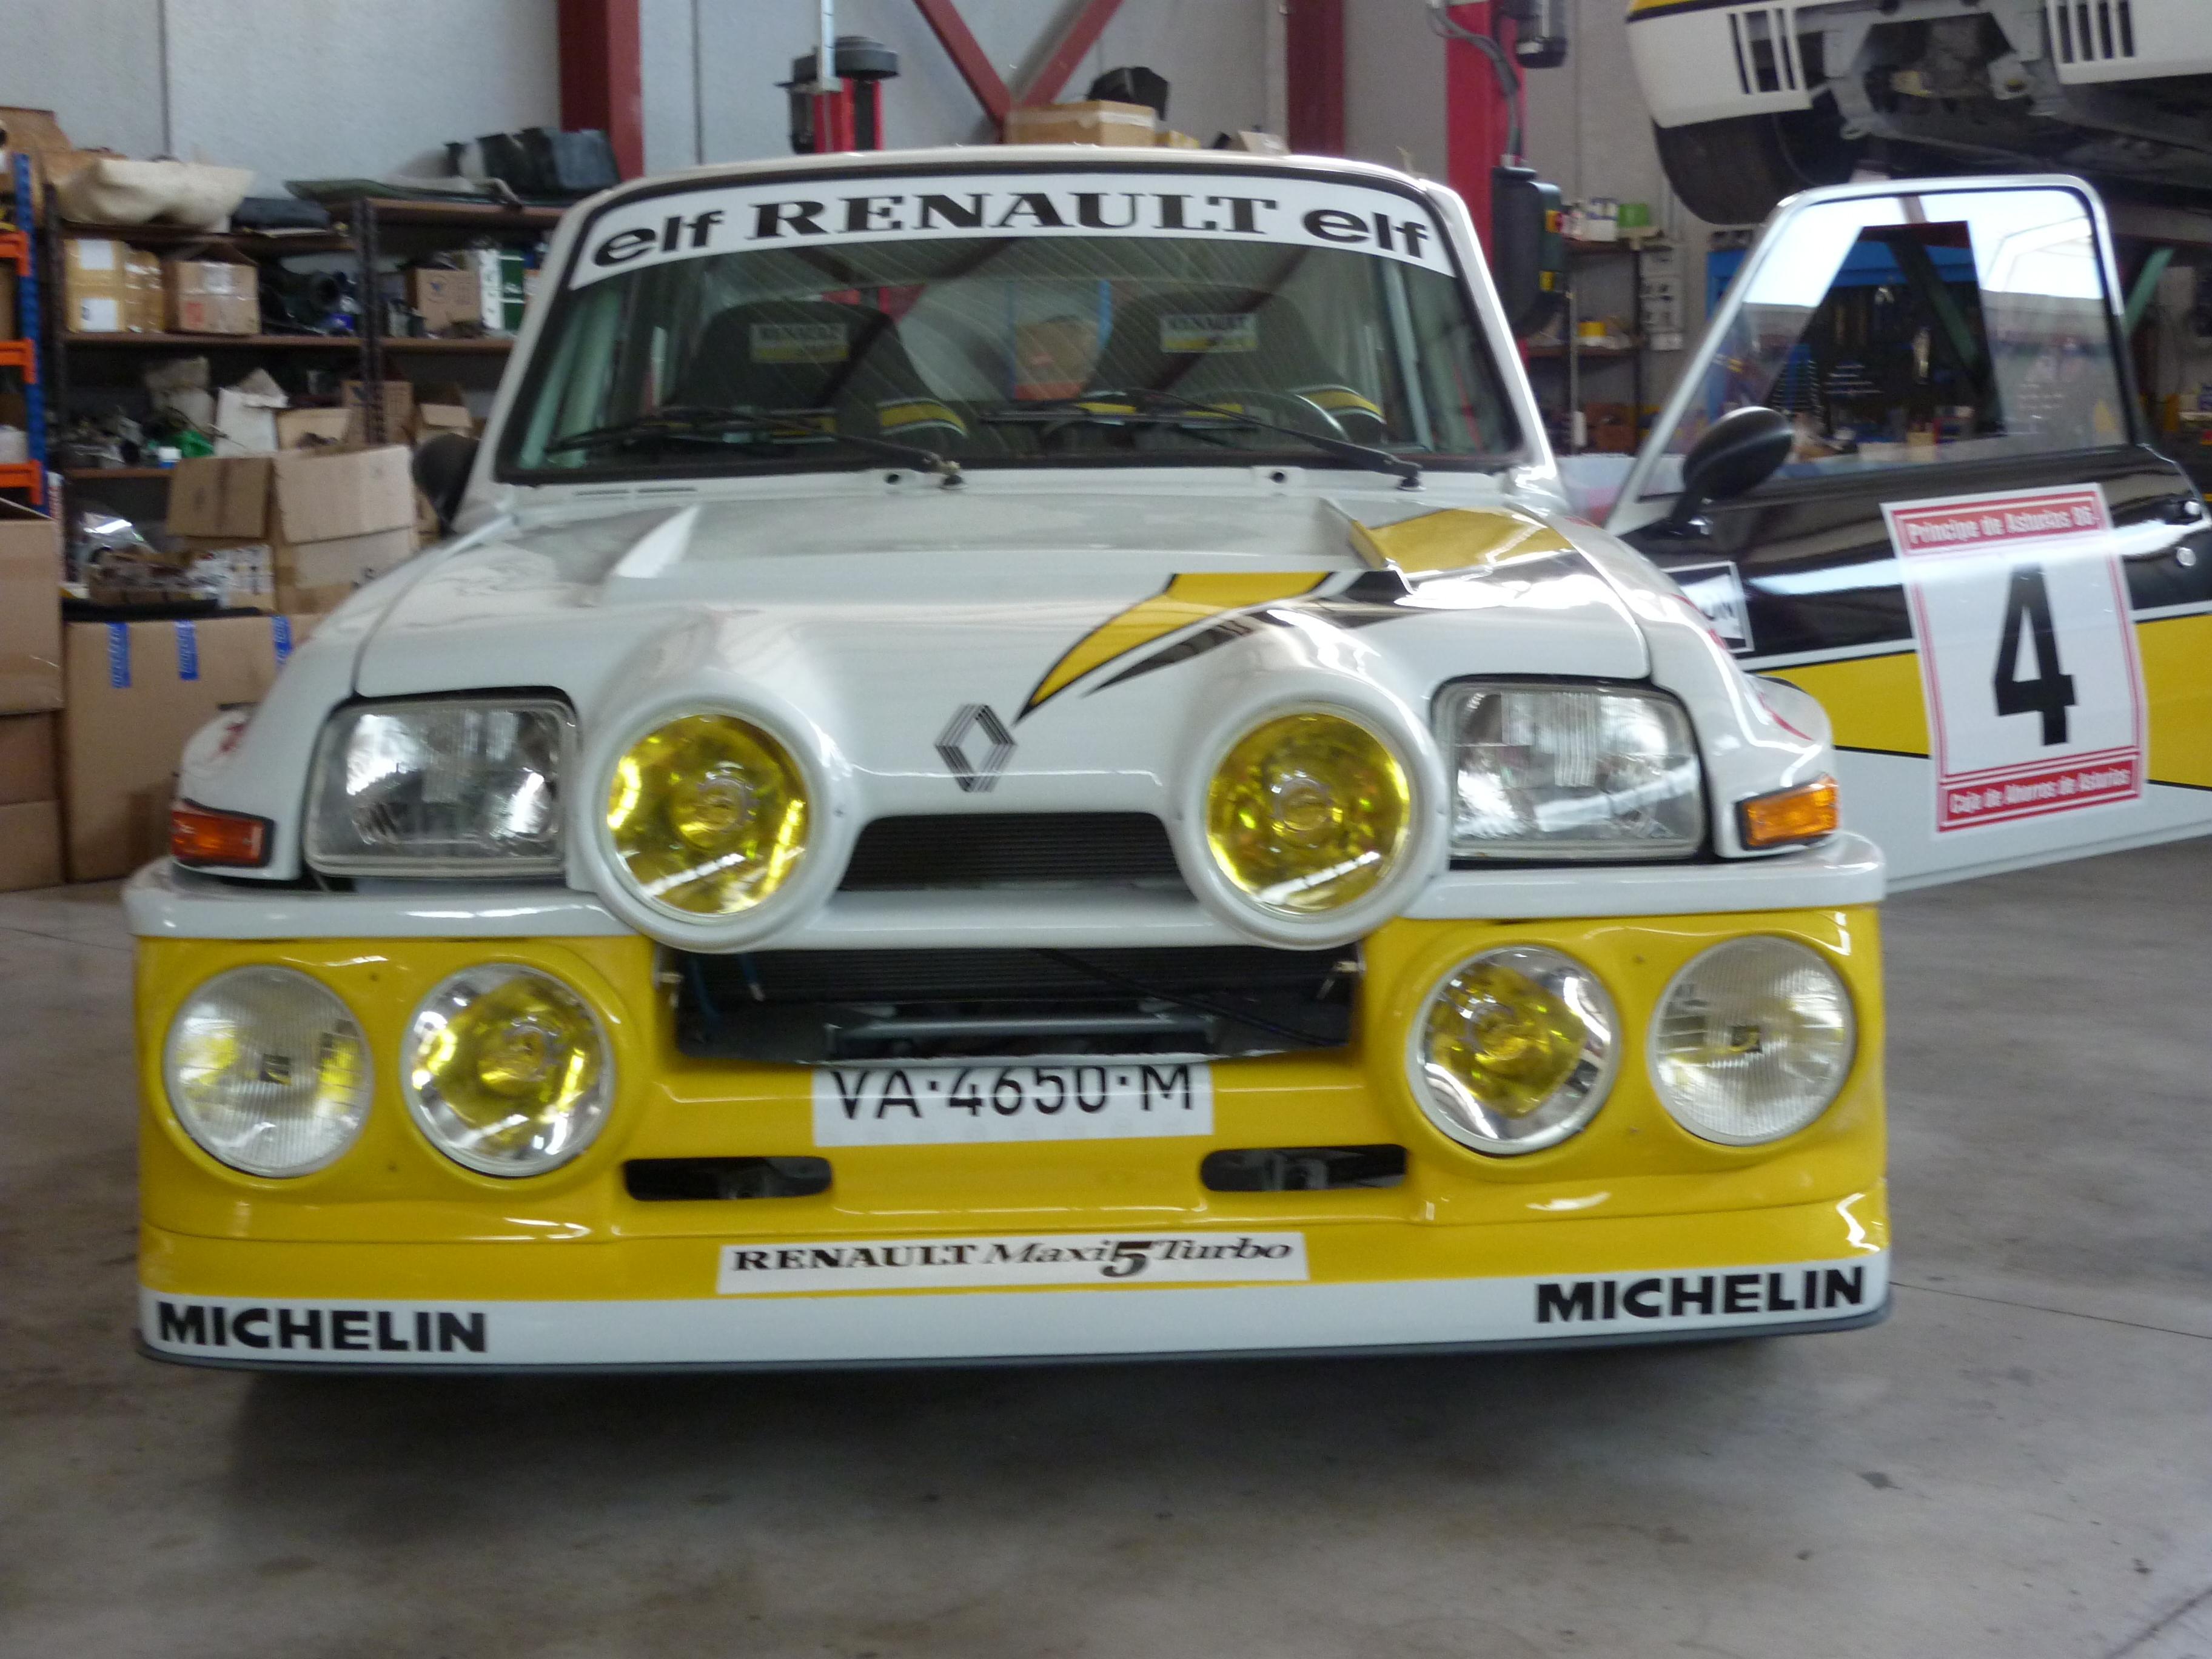 100 renault 5 turbo stock tom hartley jnr historic rally cars renault 5 turbo j ragnotti. Black Bedroom Furniture Sets. Home Design Ideas